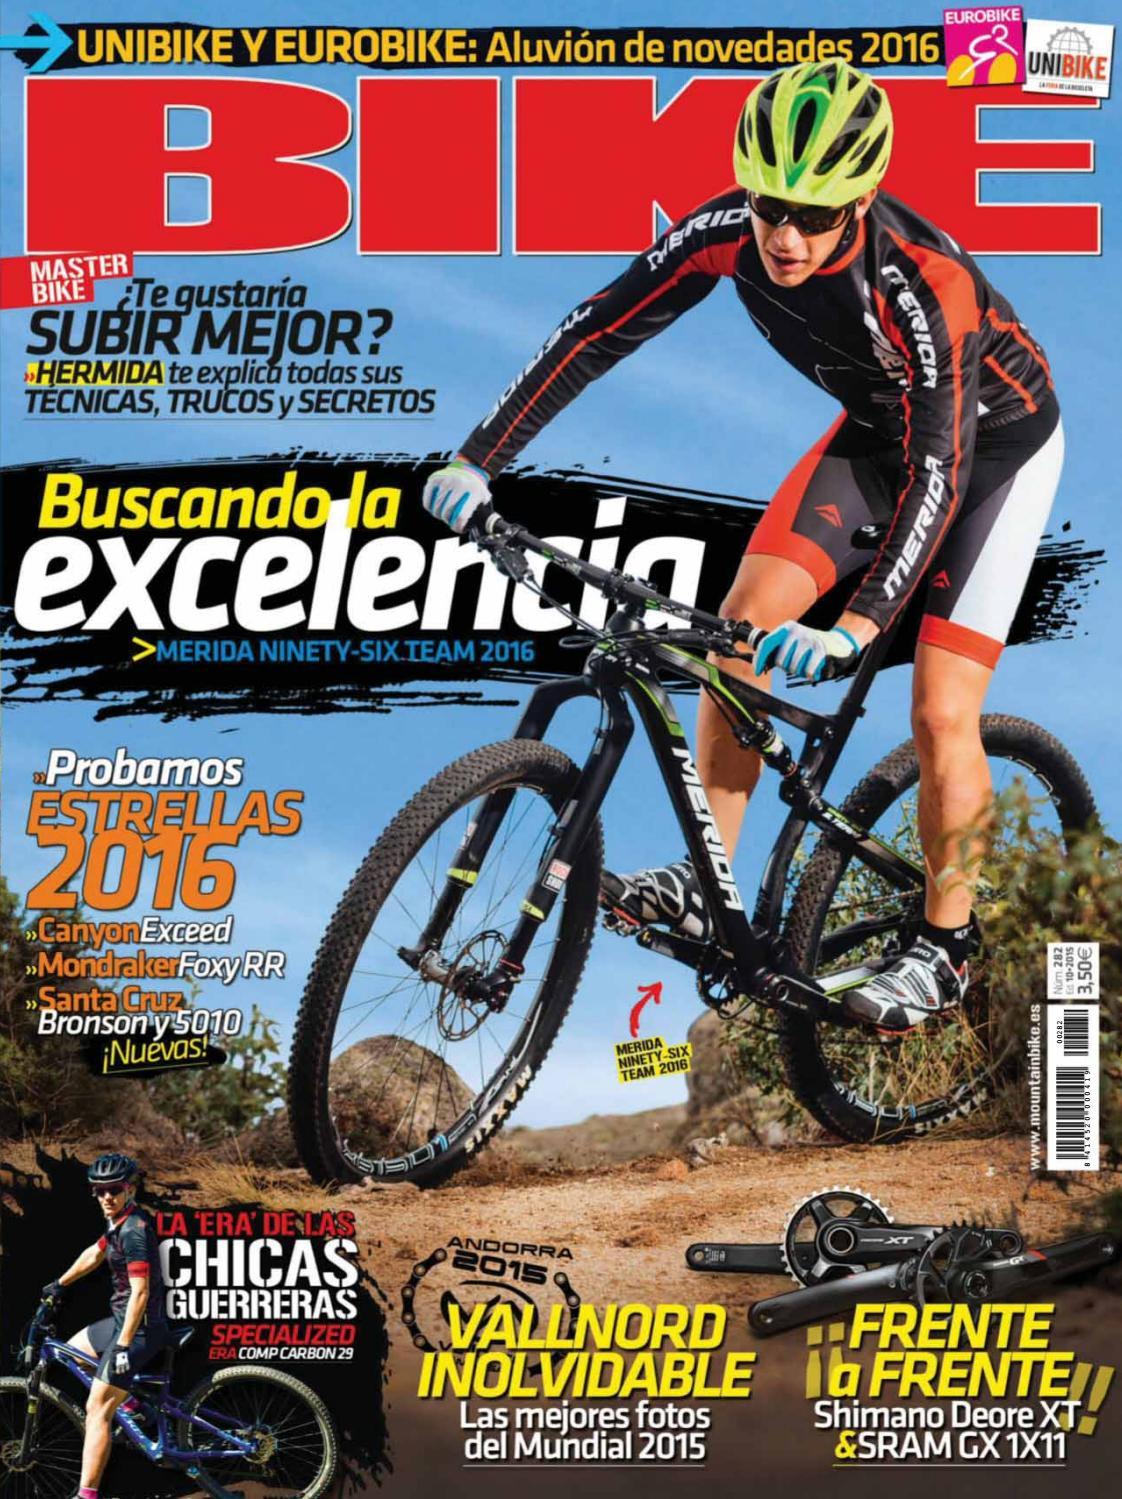 Bike españa 282 octubre 2015 by bruss7 - issuu